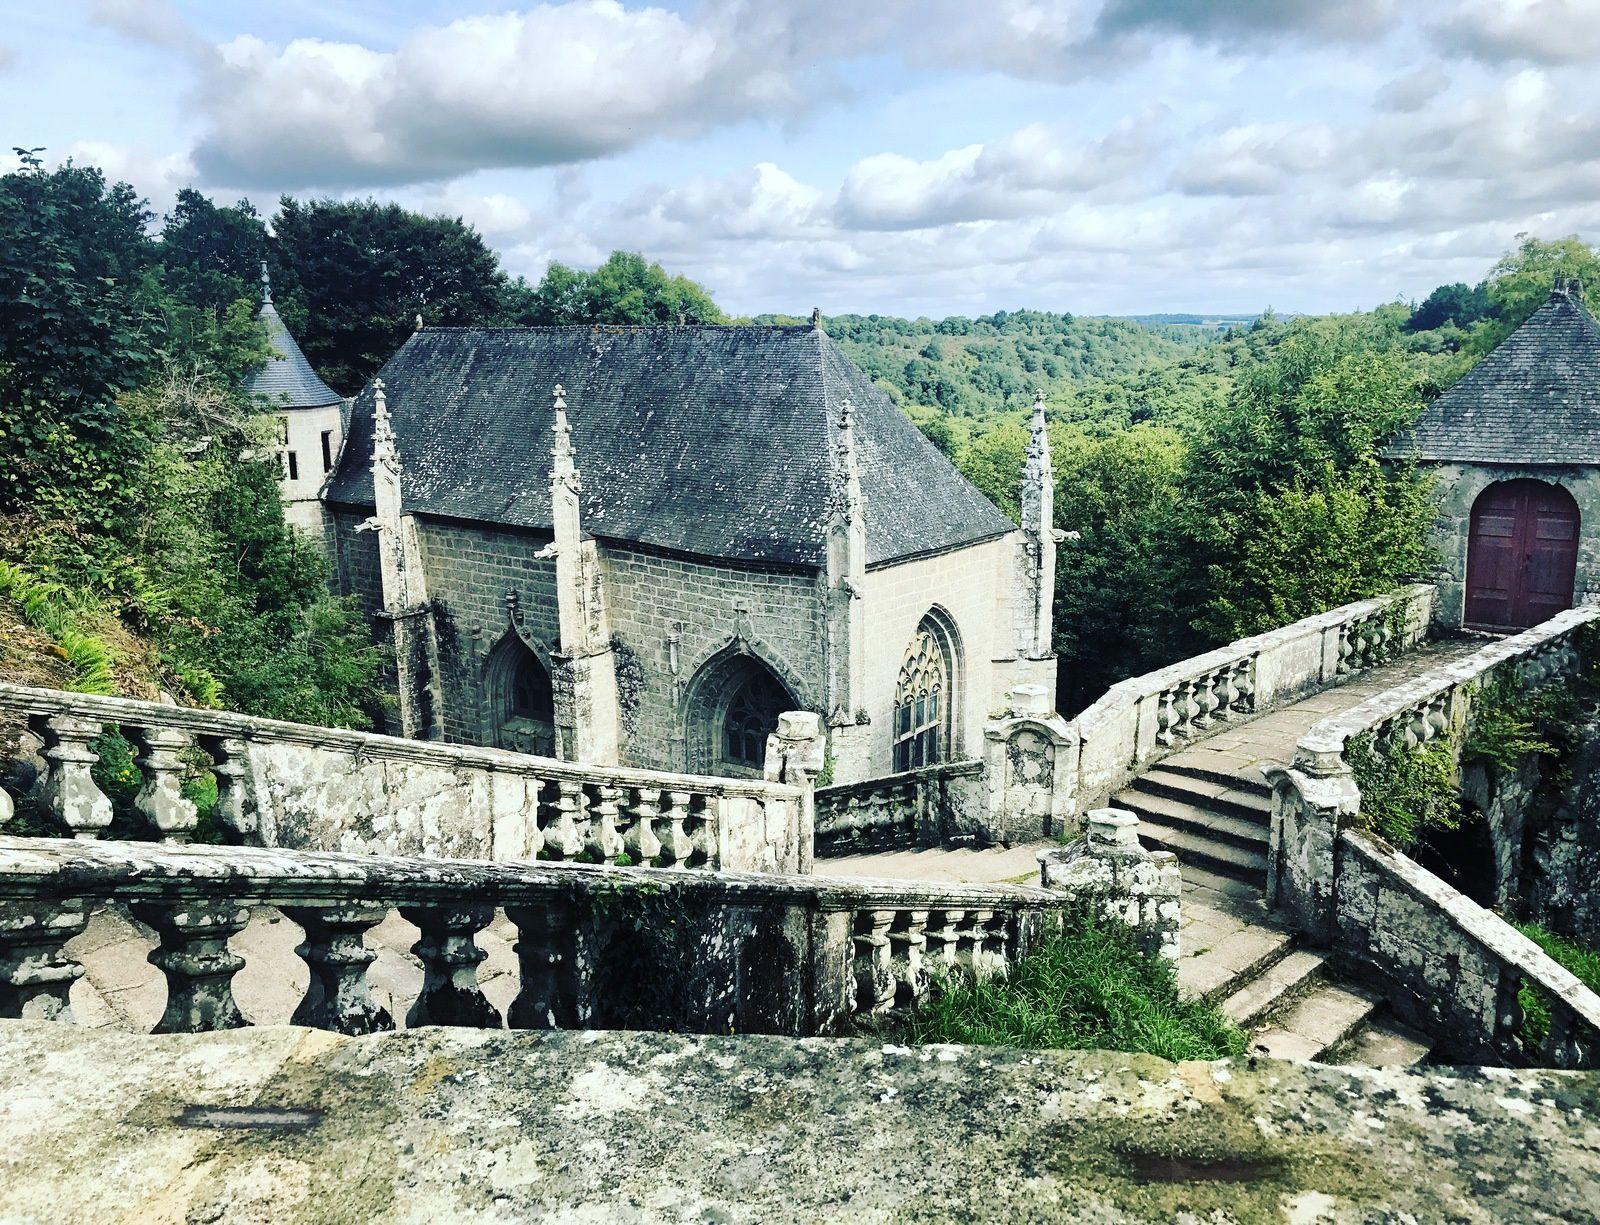 Le Faouet - Quistinic - Inzinzac Lochrist - Landevant - Ploemel - Carnac - Damgan - Arzal - La Roche Bernard - Pénestin